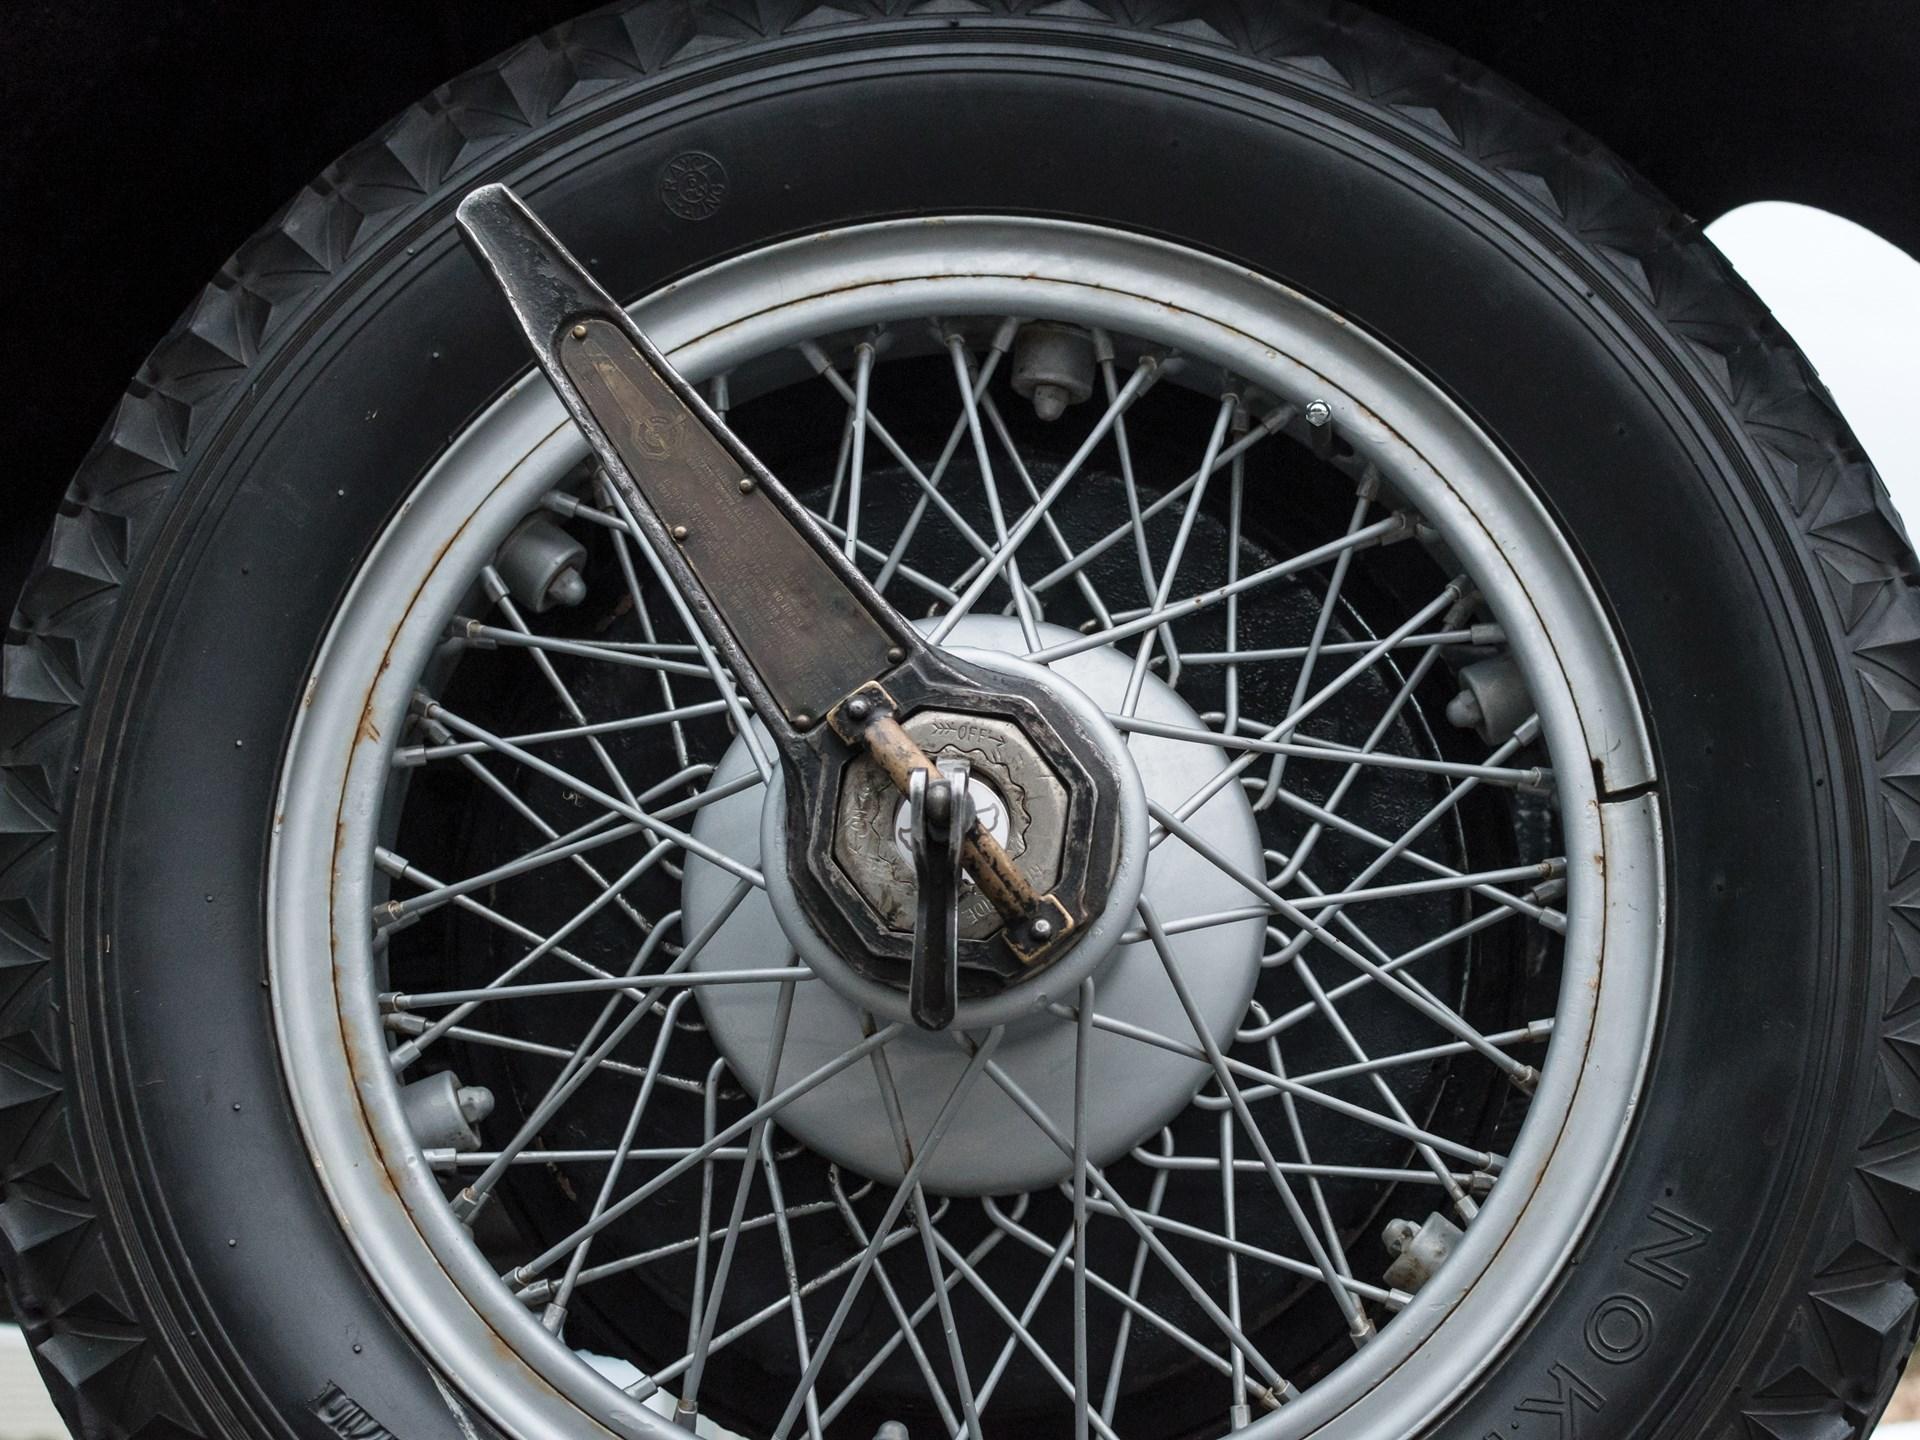 Stutz wheel brace